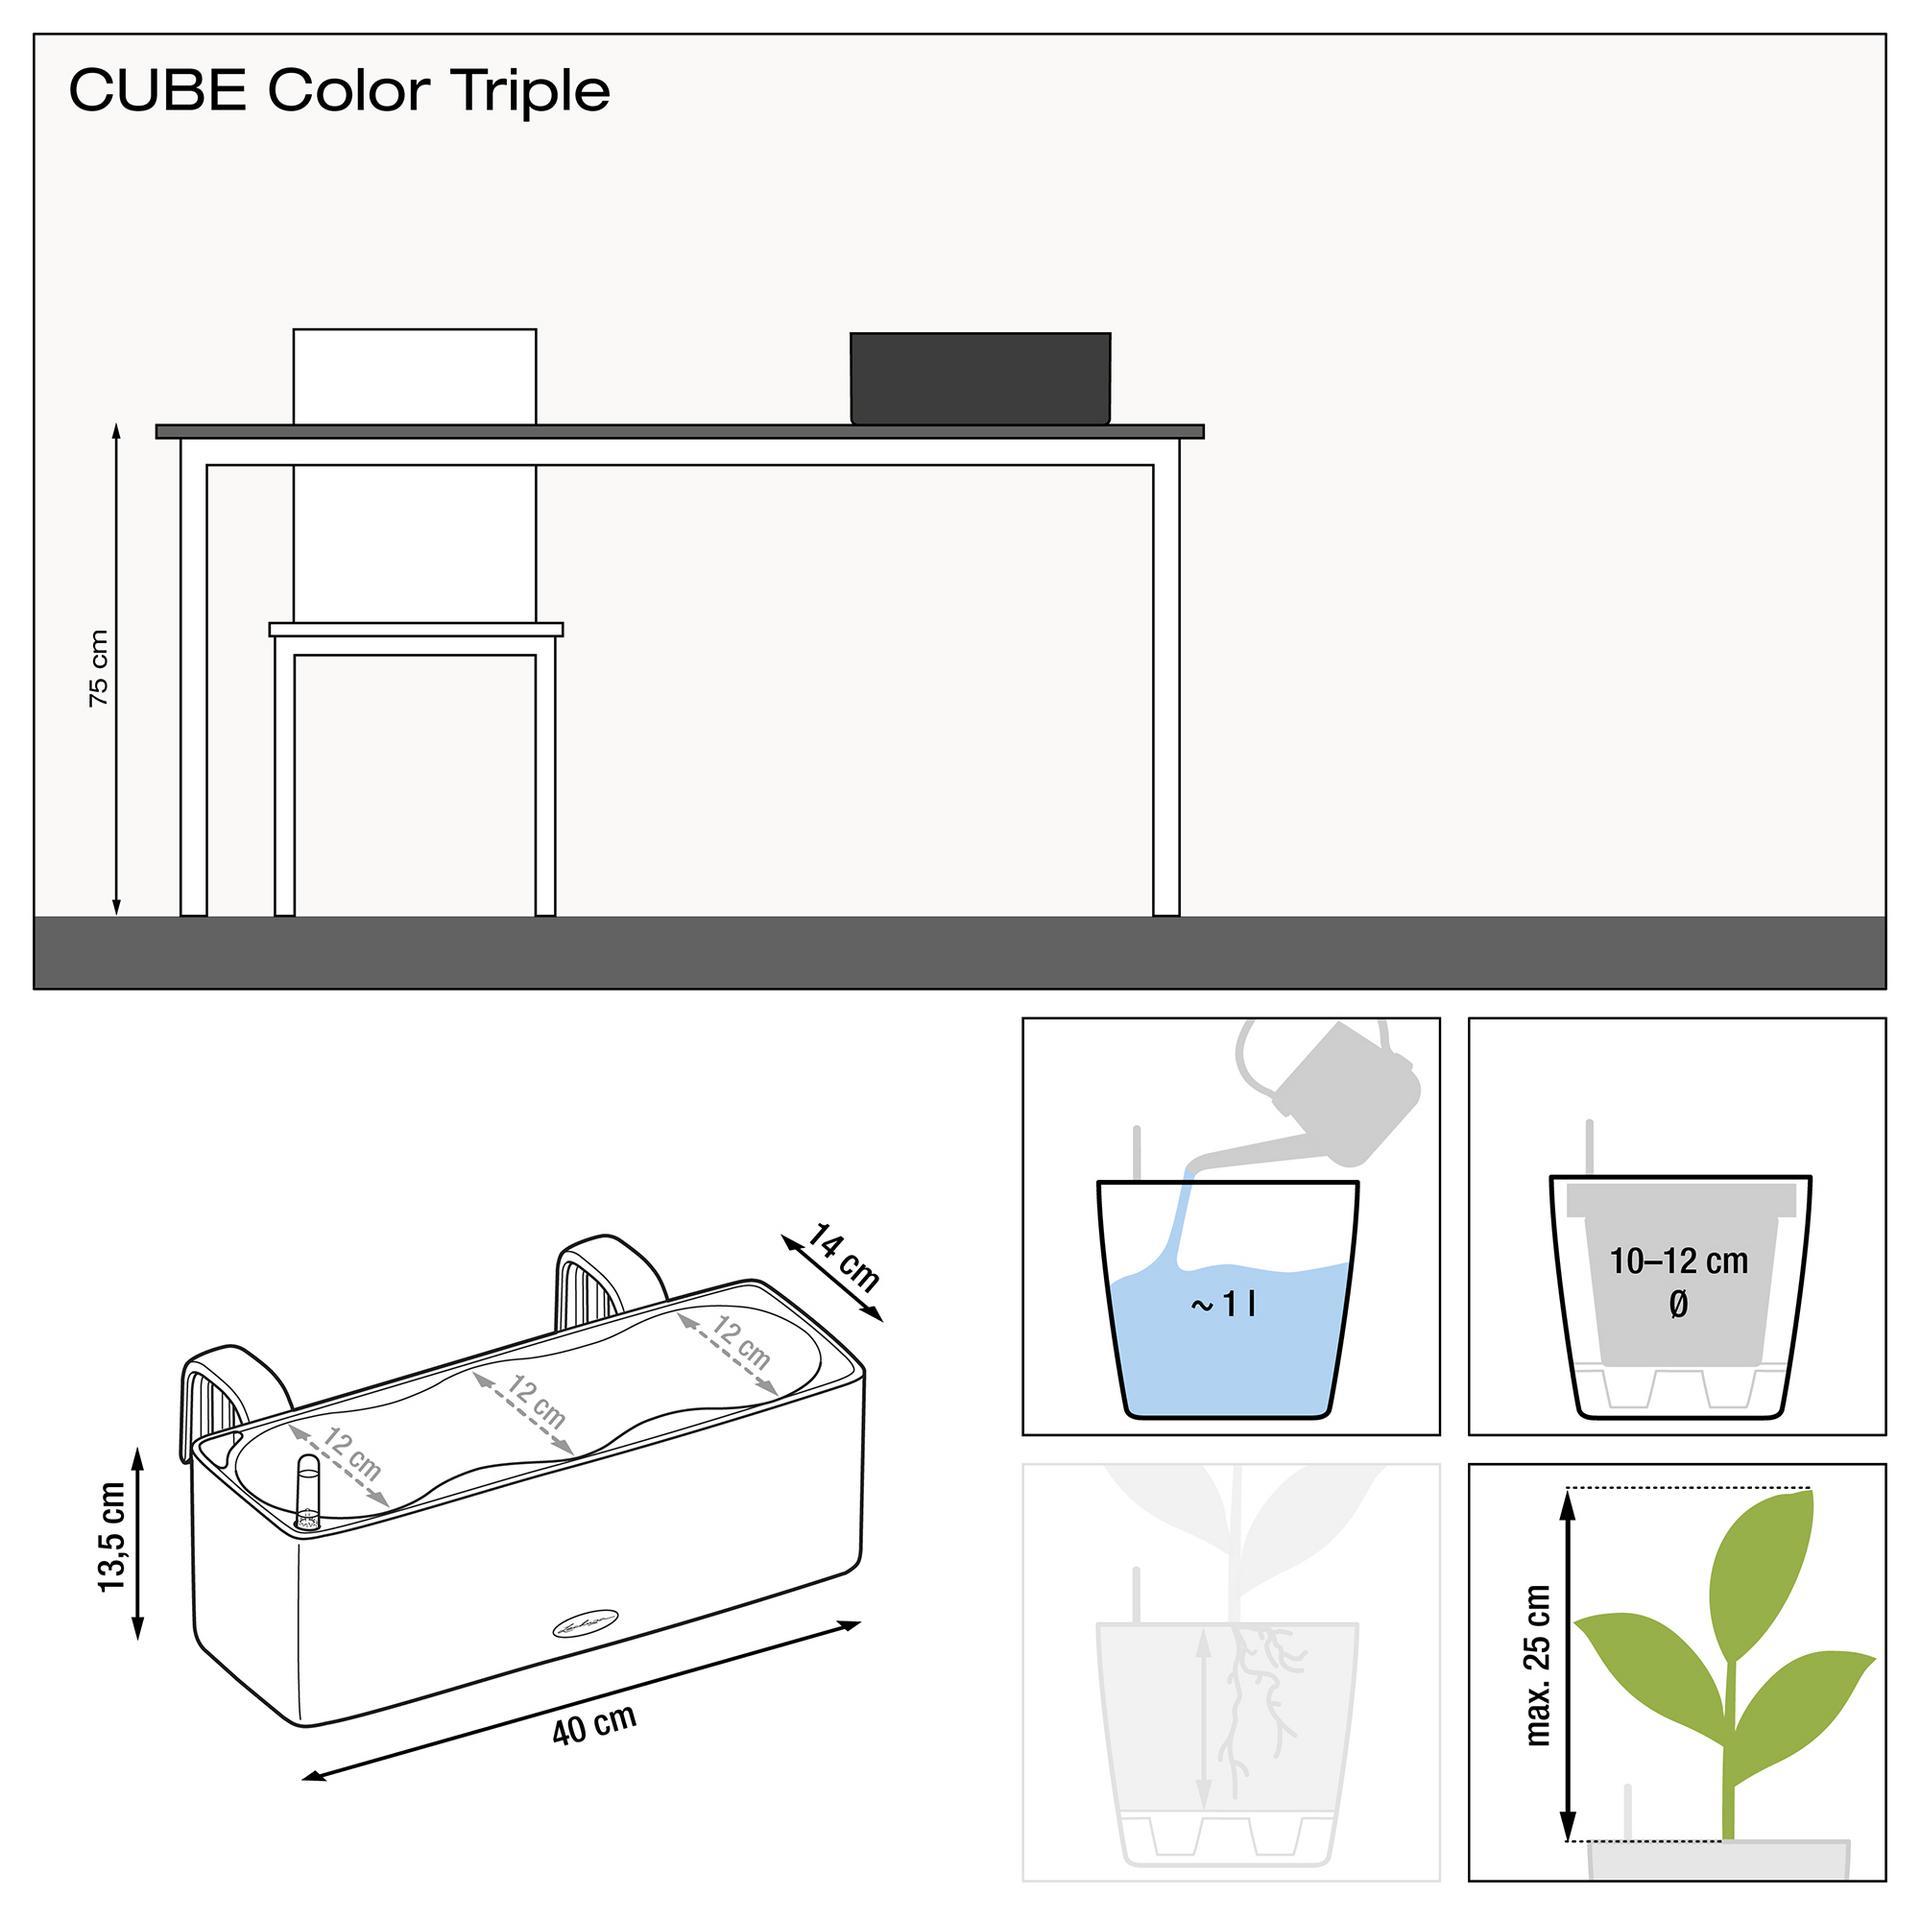 le_cube-color-triple_product_addi_nz